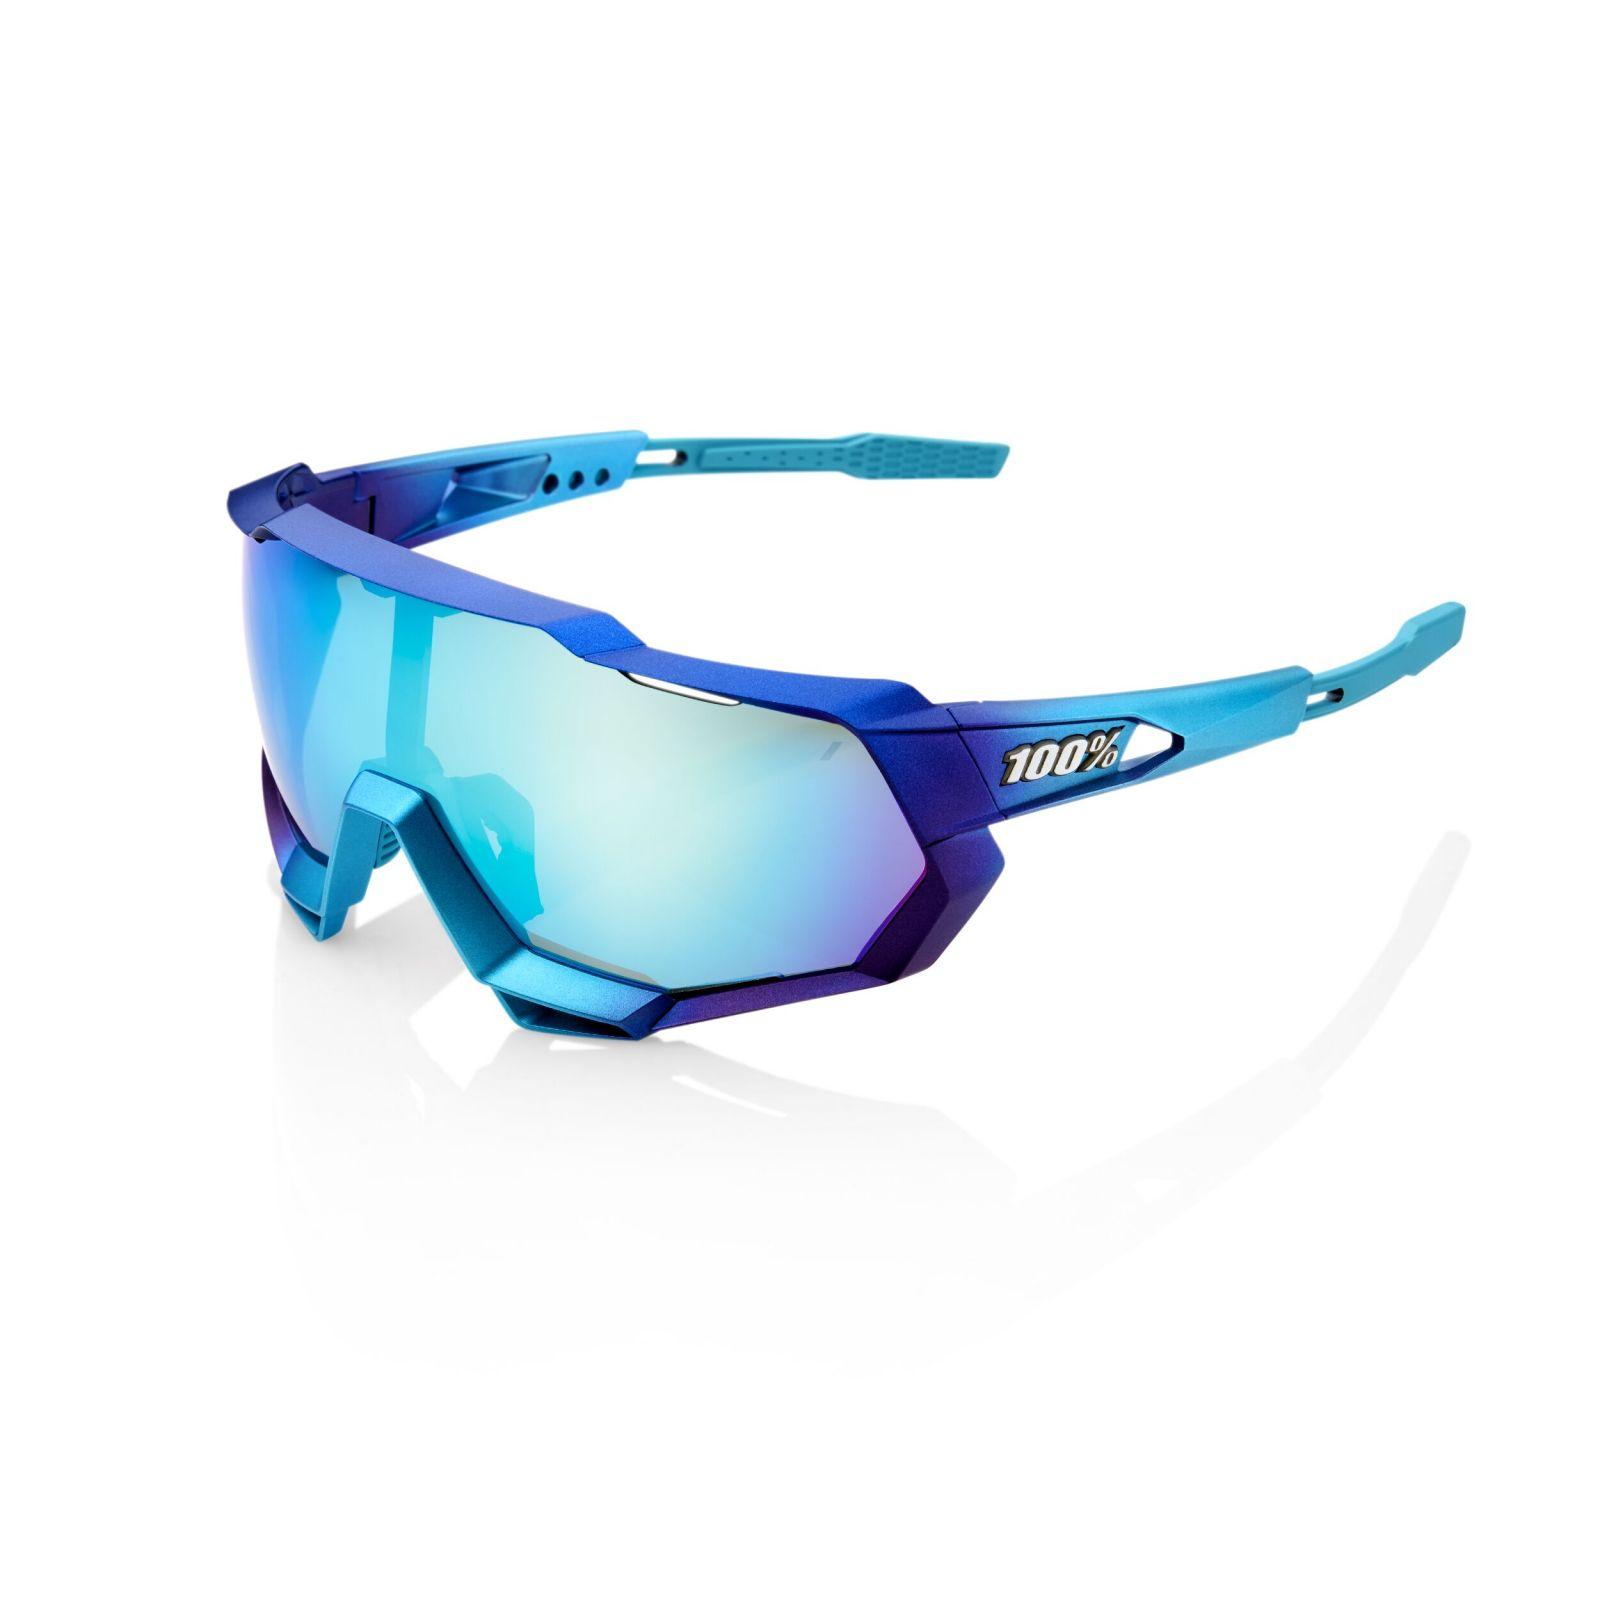 Brýle 100% SpeedTrap Matte Metalic into the Fade/Blue Topaz Multilayer Mirror Lens, 61023-390-69